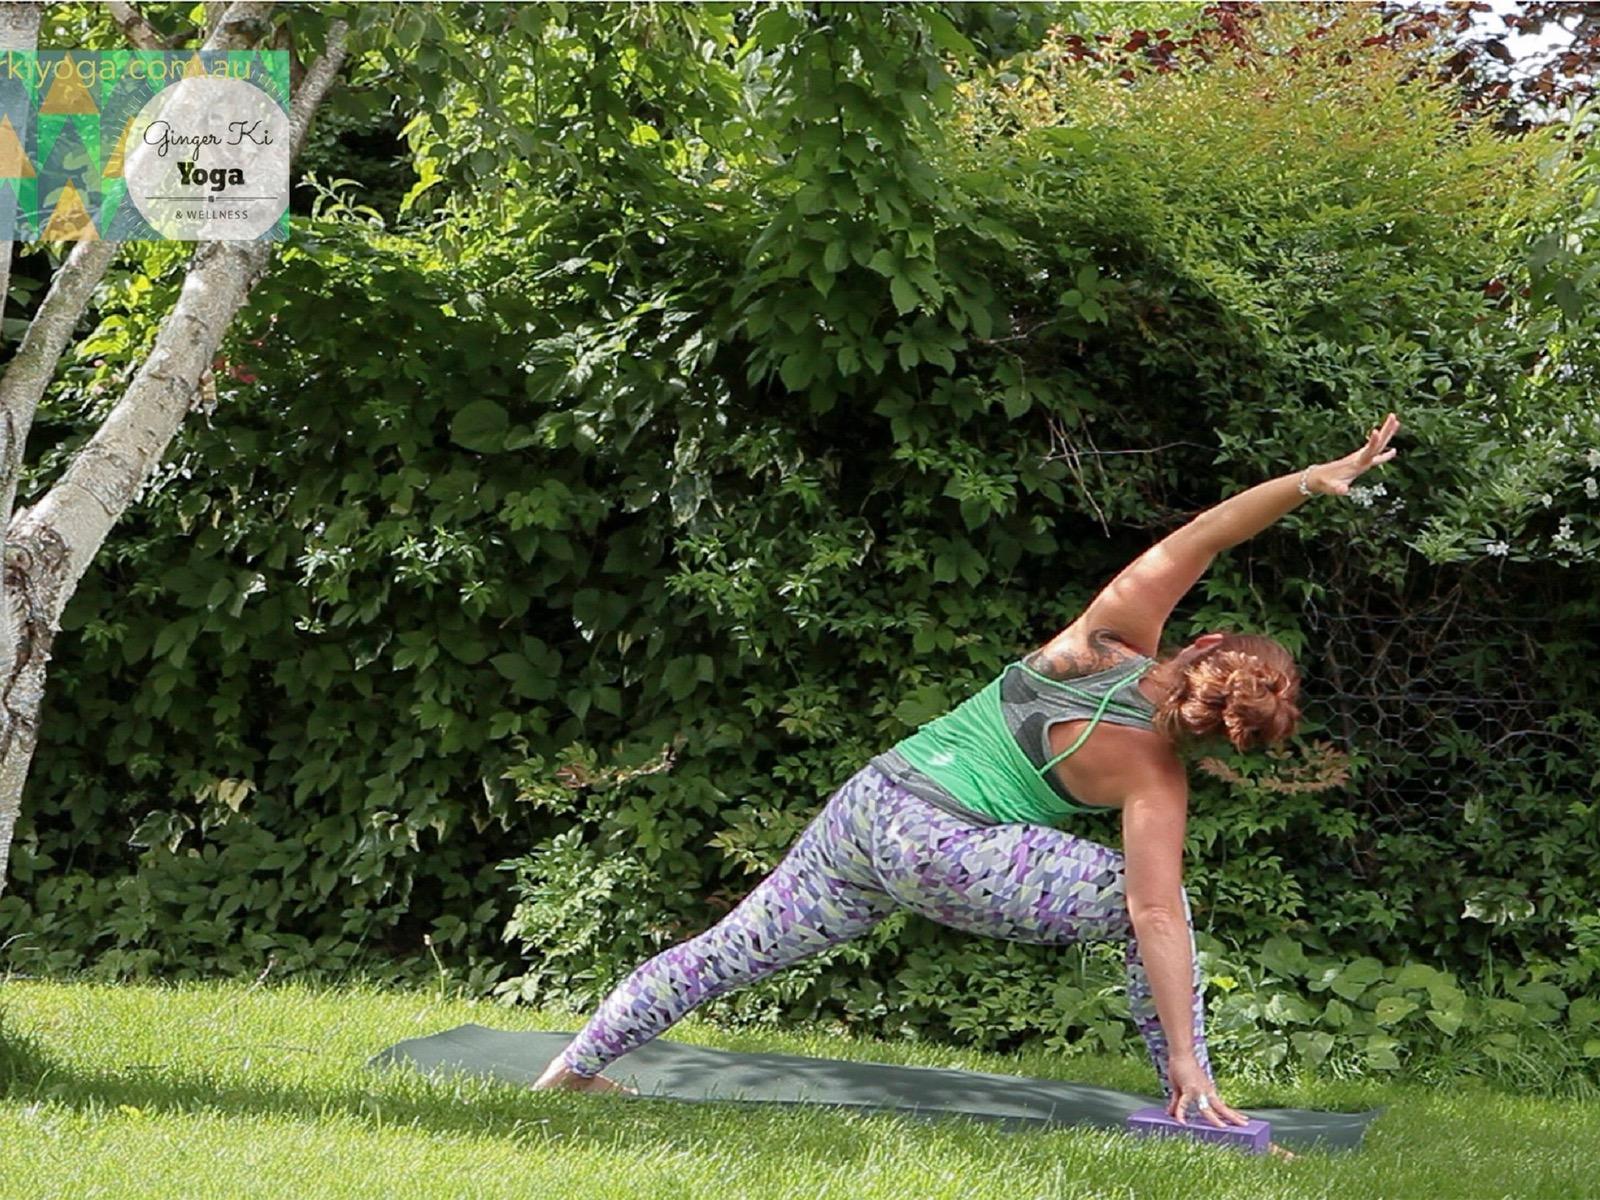 Vinyasa yoga classes running weekly